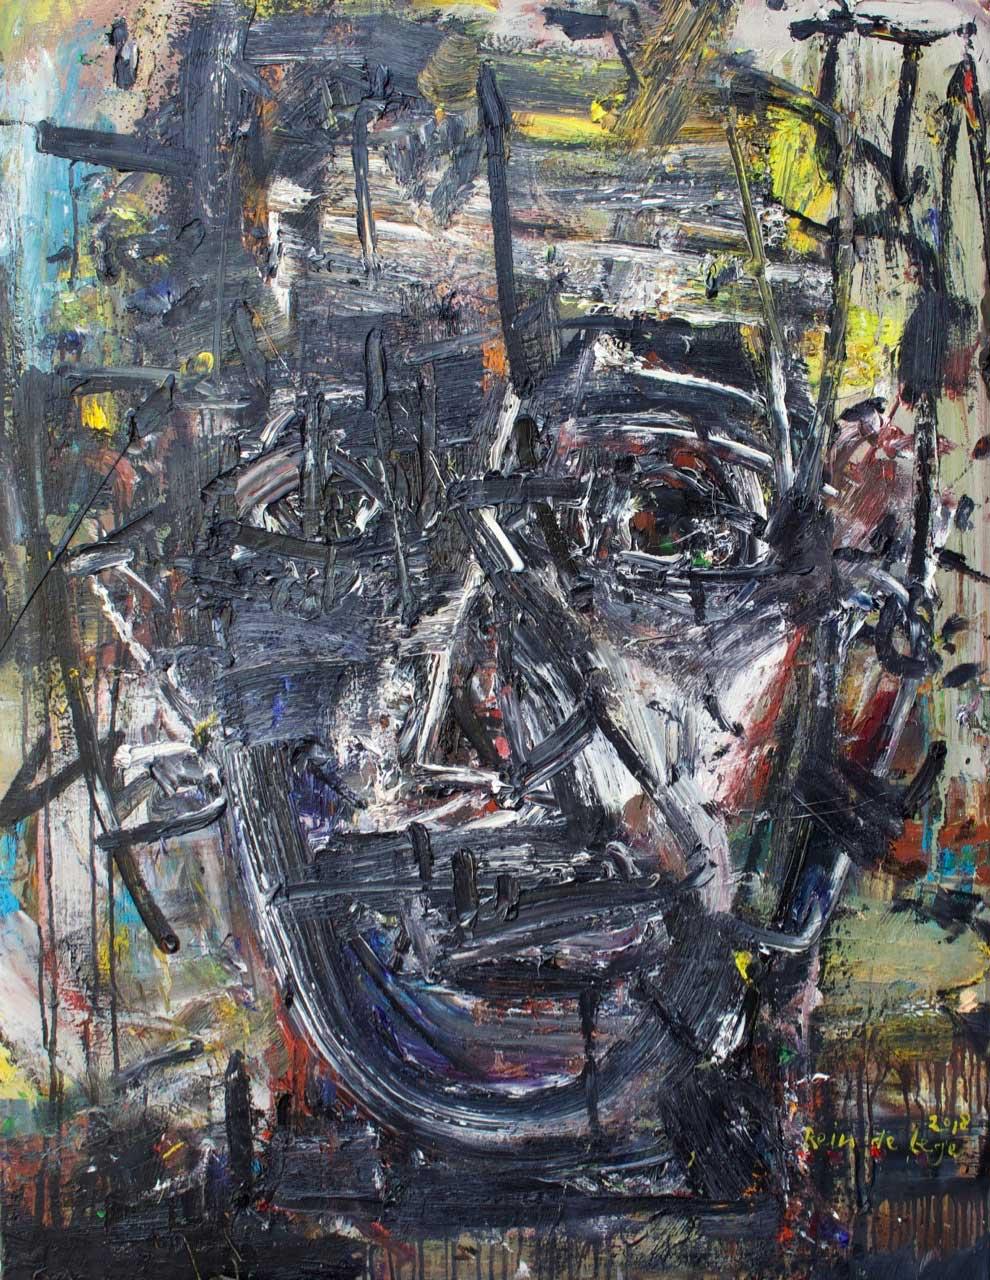 2018 Oil on canvas 116/89 cm.